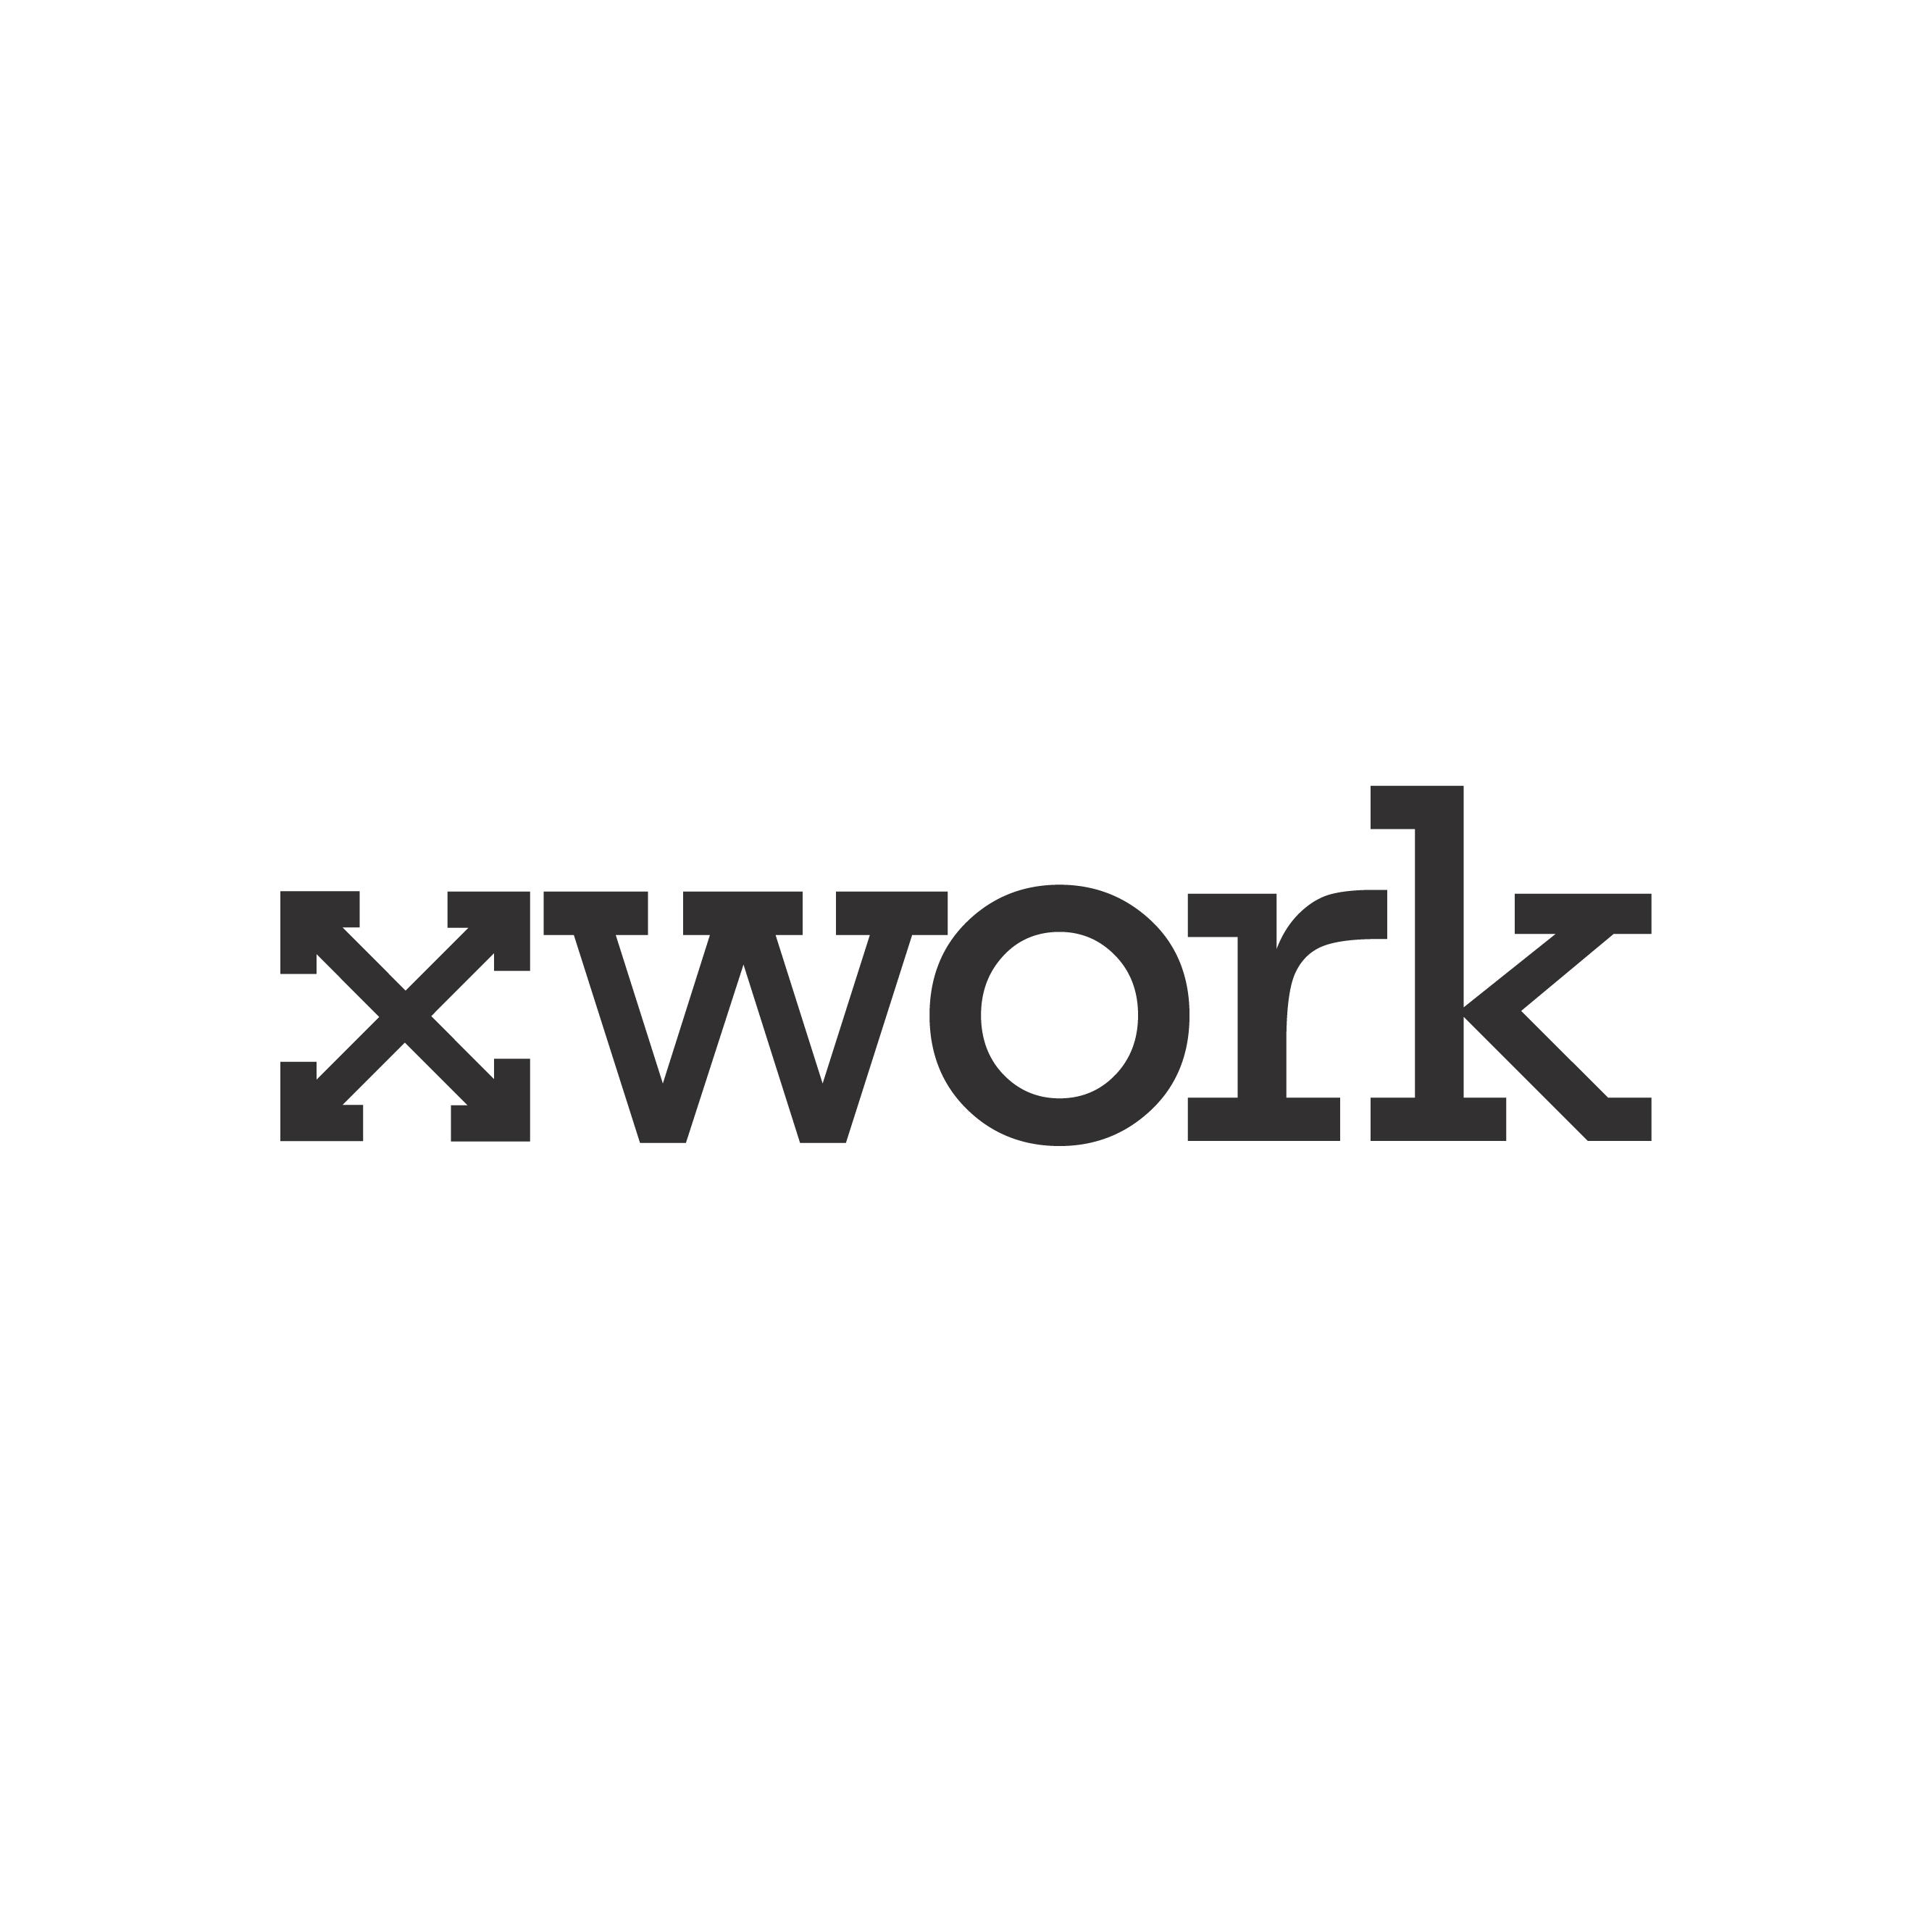 XWORK company logo